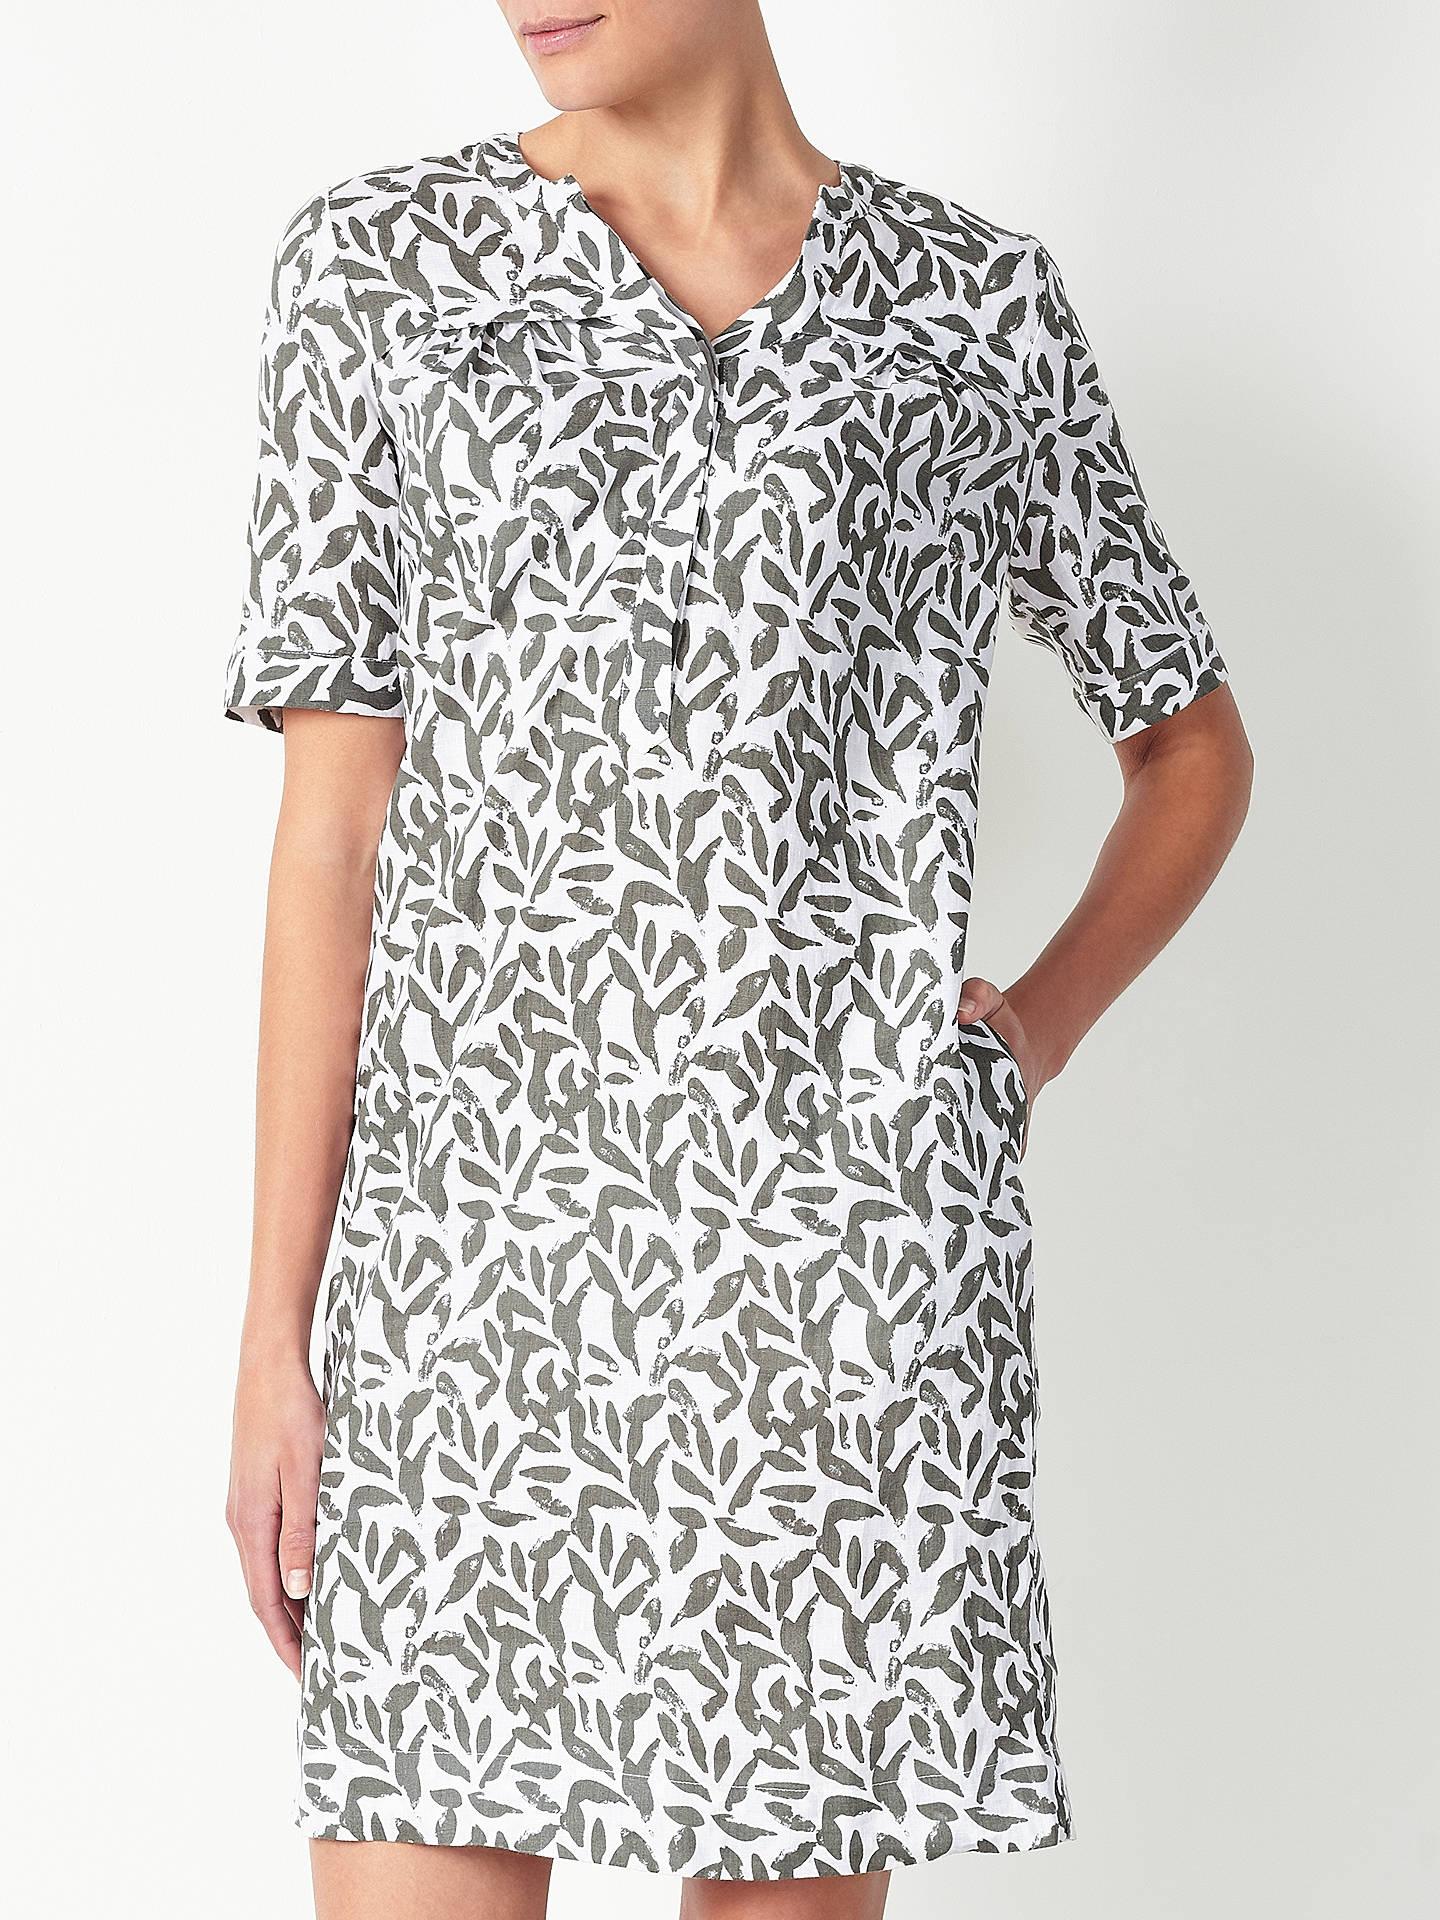 acc612d498 ... Buy John Lewis Leaf Print Linen Notch Neck Dress